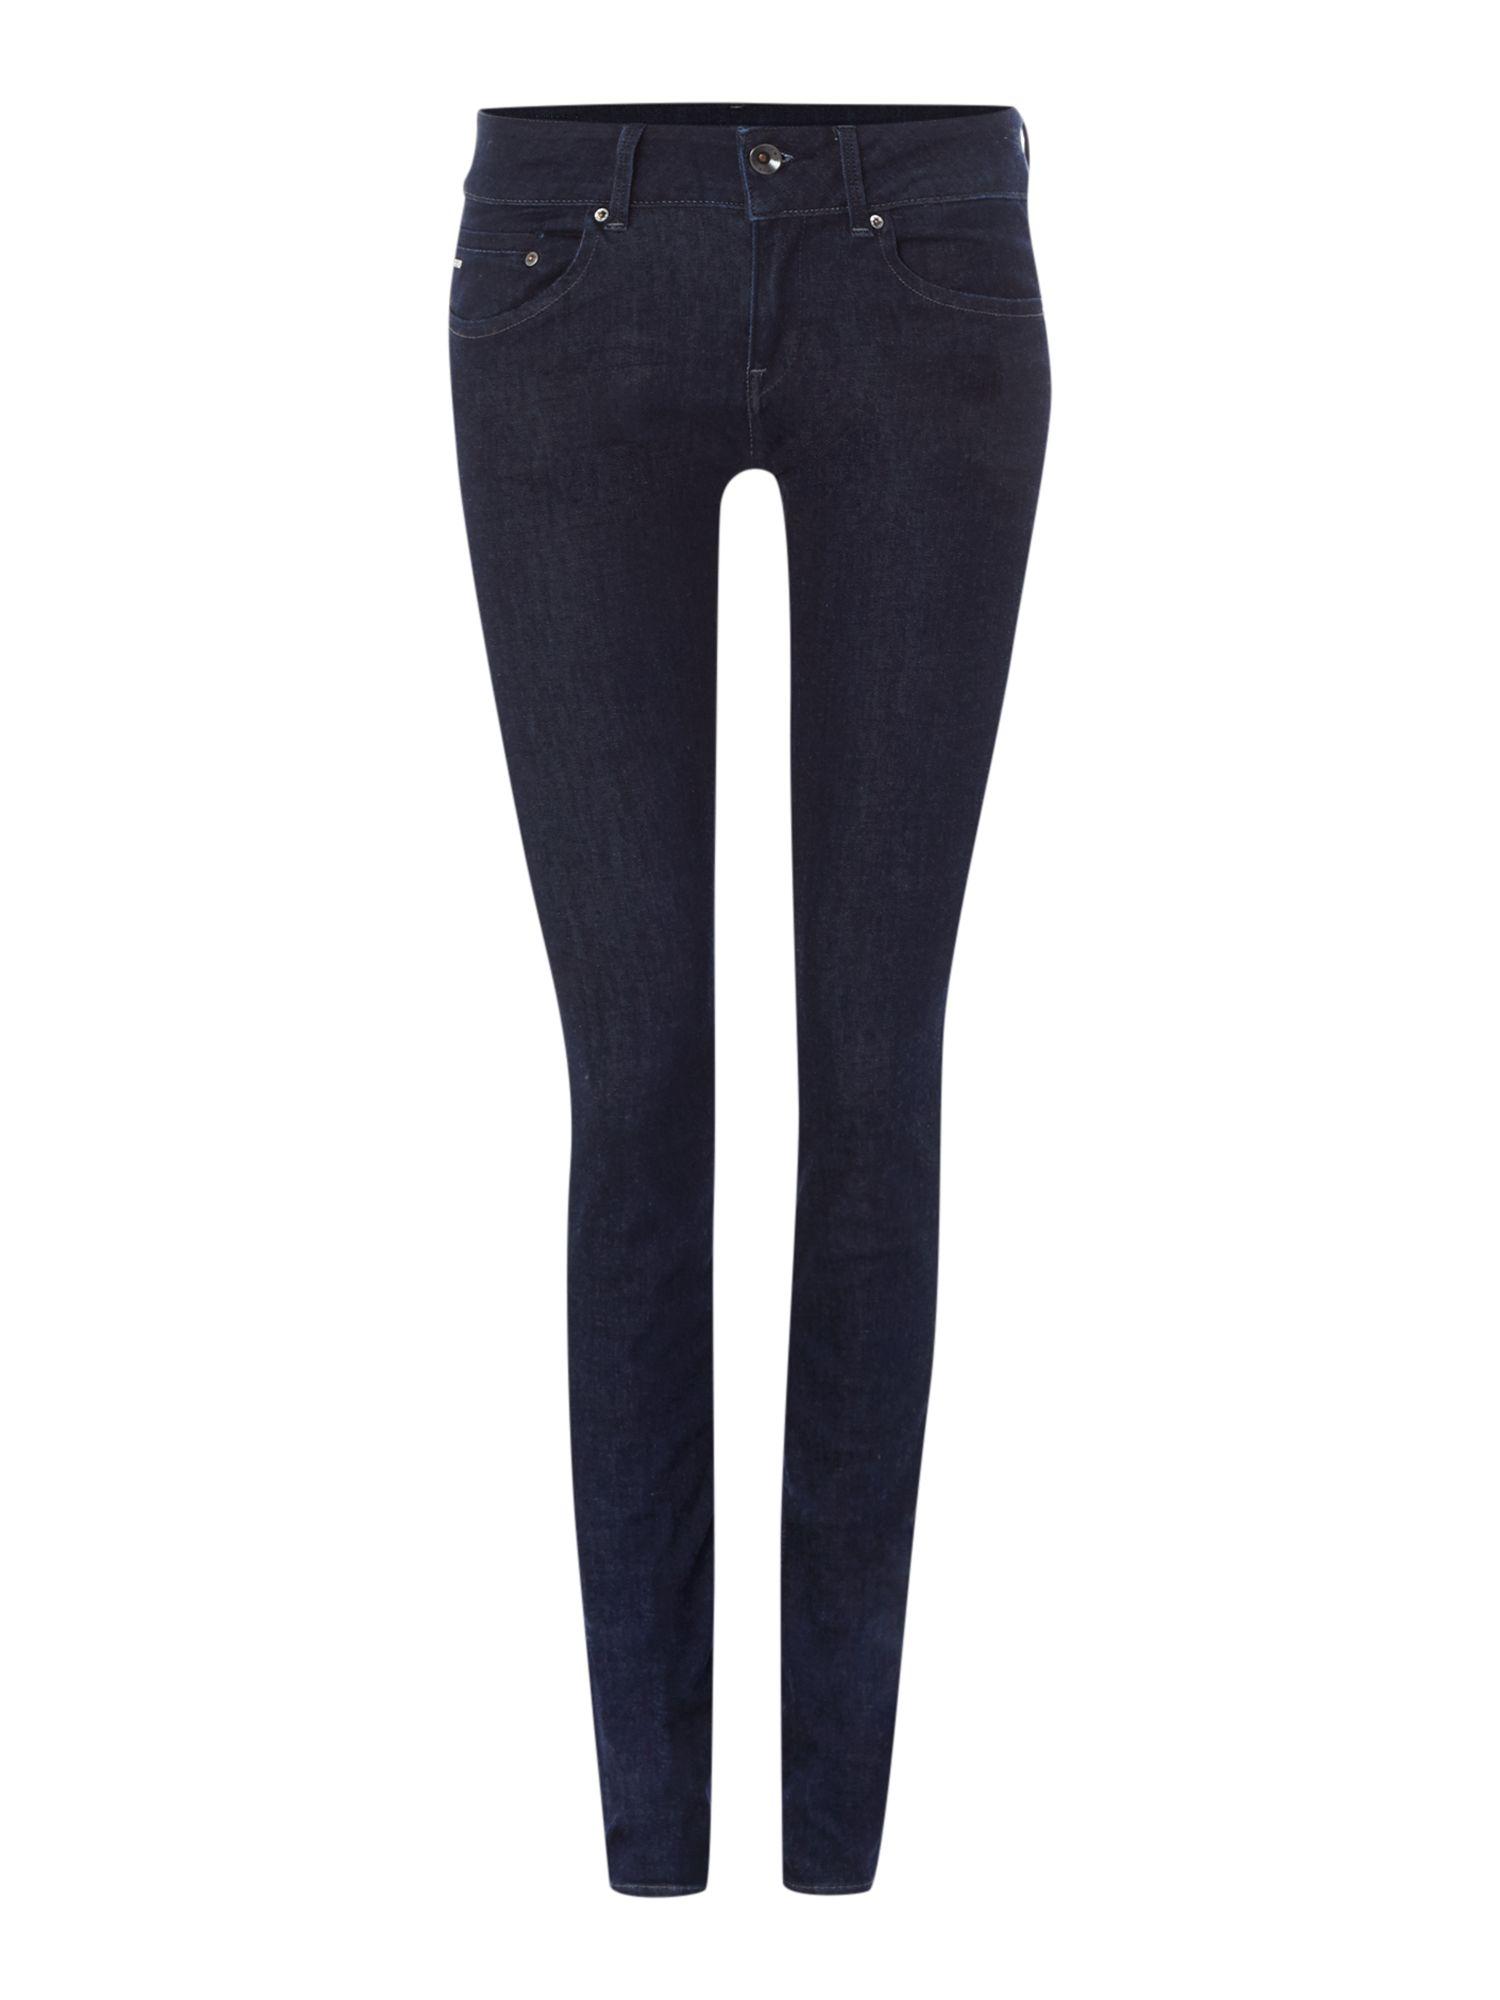 star raw midge cody skinny jean in rinsed in blue denim dark indigo. Black Bedroom Furniture Sets. Home Design Ideas